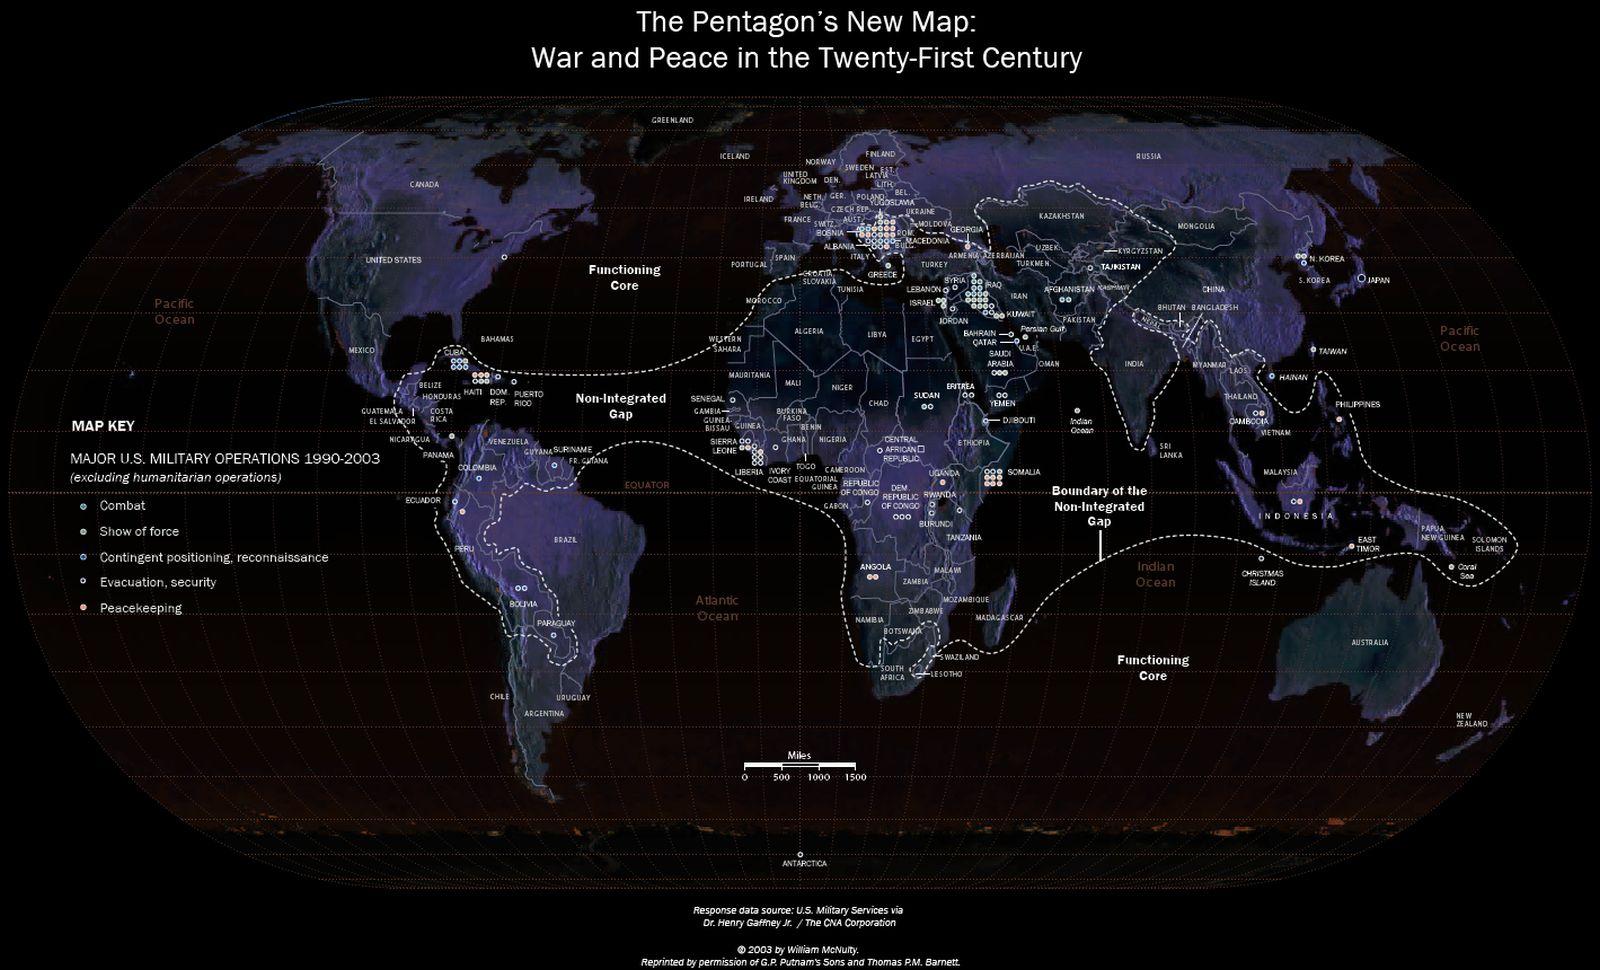 USA World Wallpaper 1600x970 USA World Map Government 1600x970